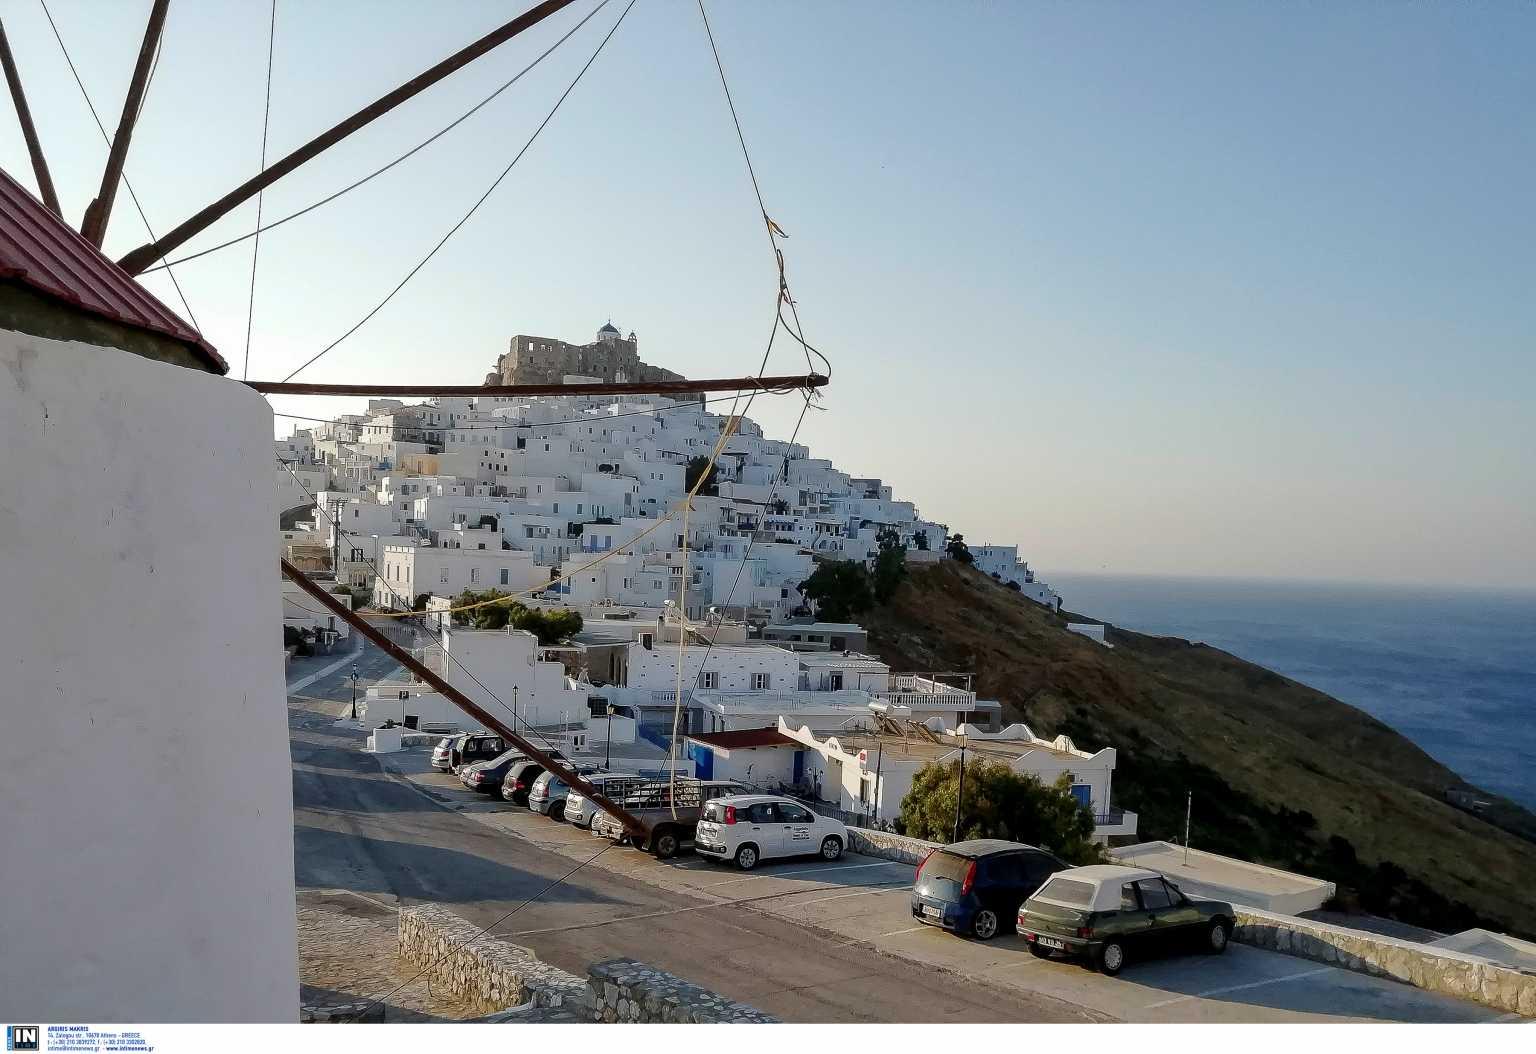 To Der Spiegel διαφημίζει τα ελληνικά νησιά: «Ήλιος, θάλασσα και χωρίς Covid»